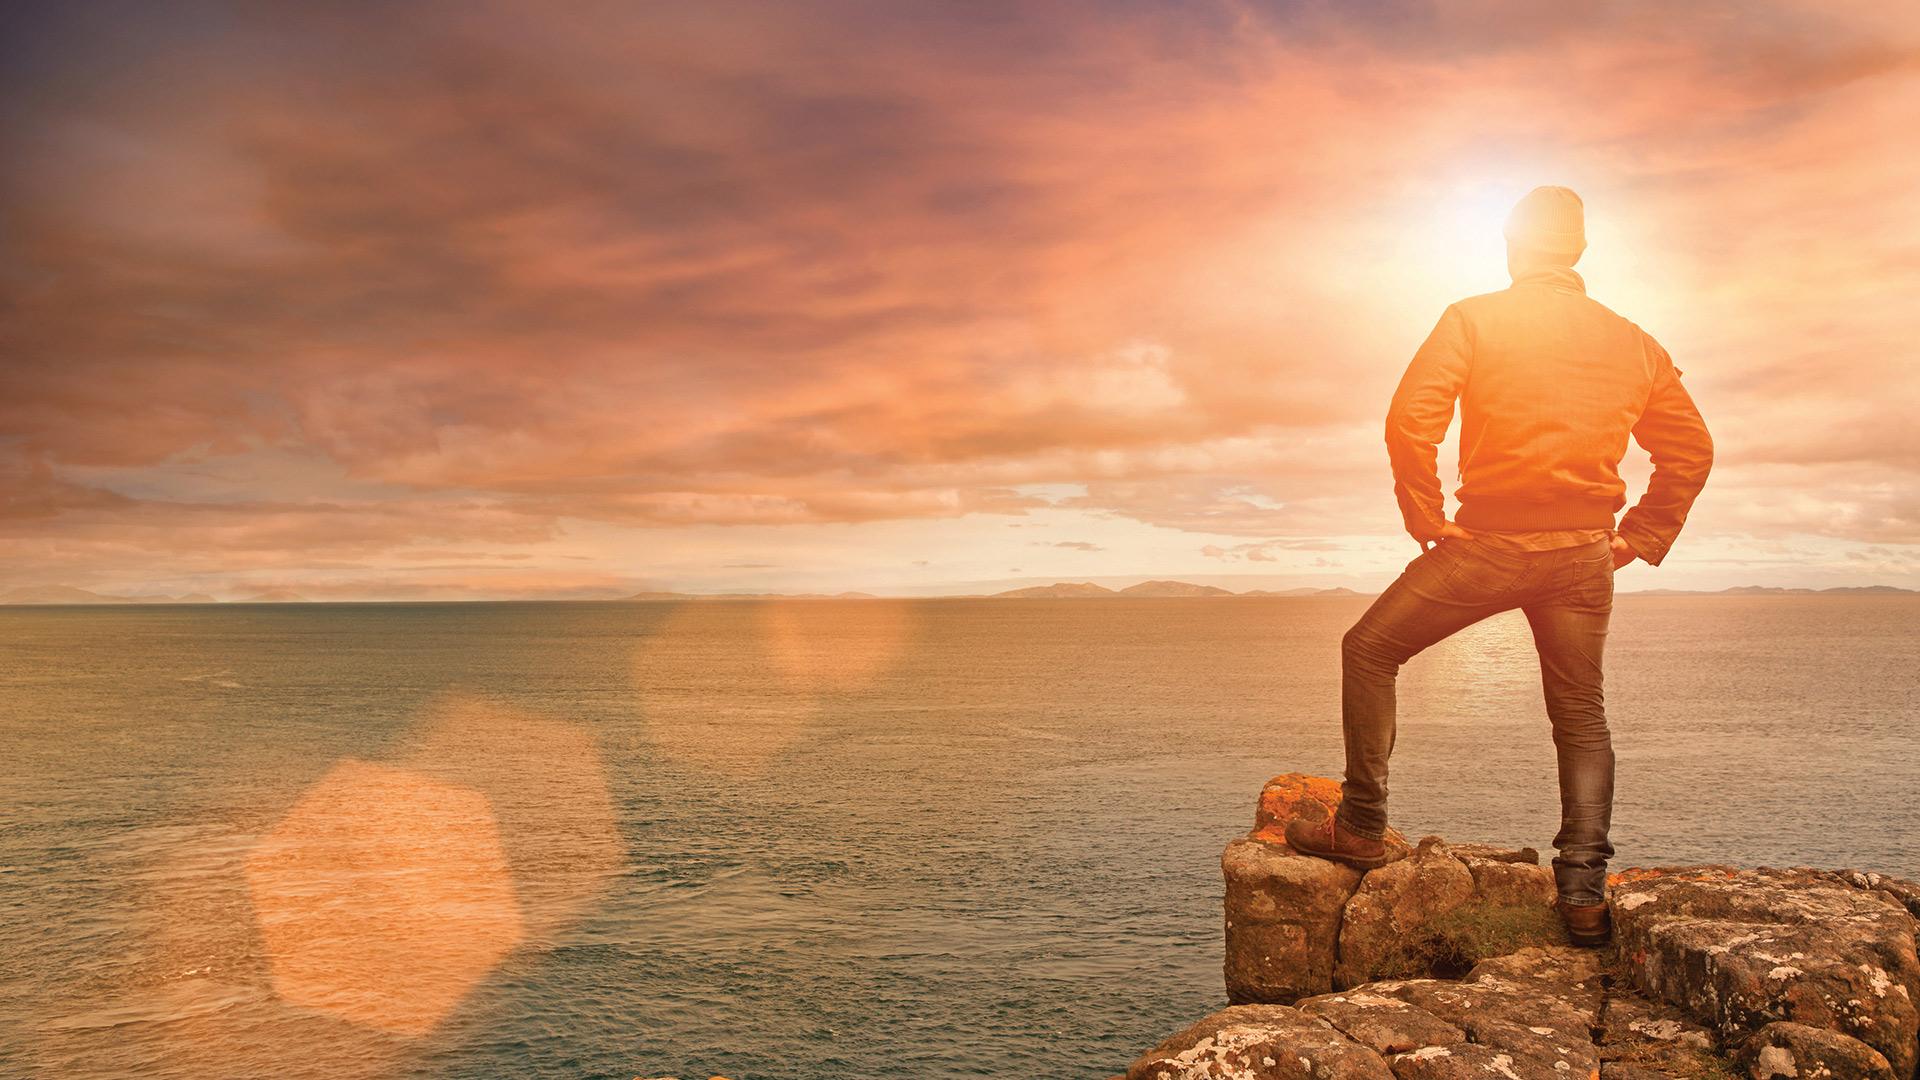 Risk mindfulness